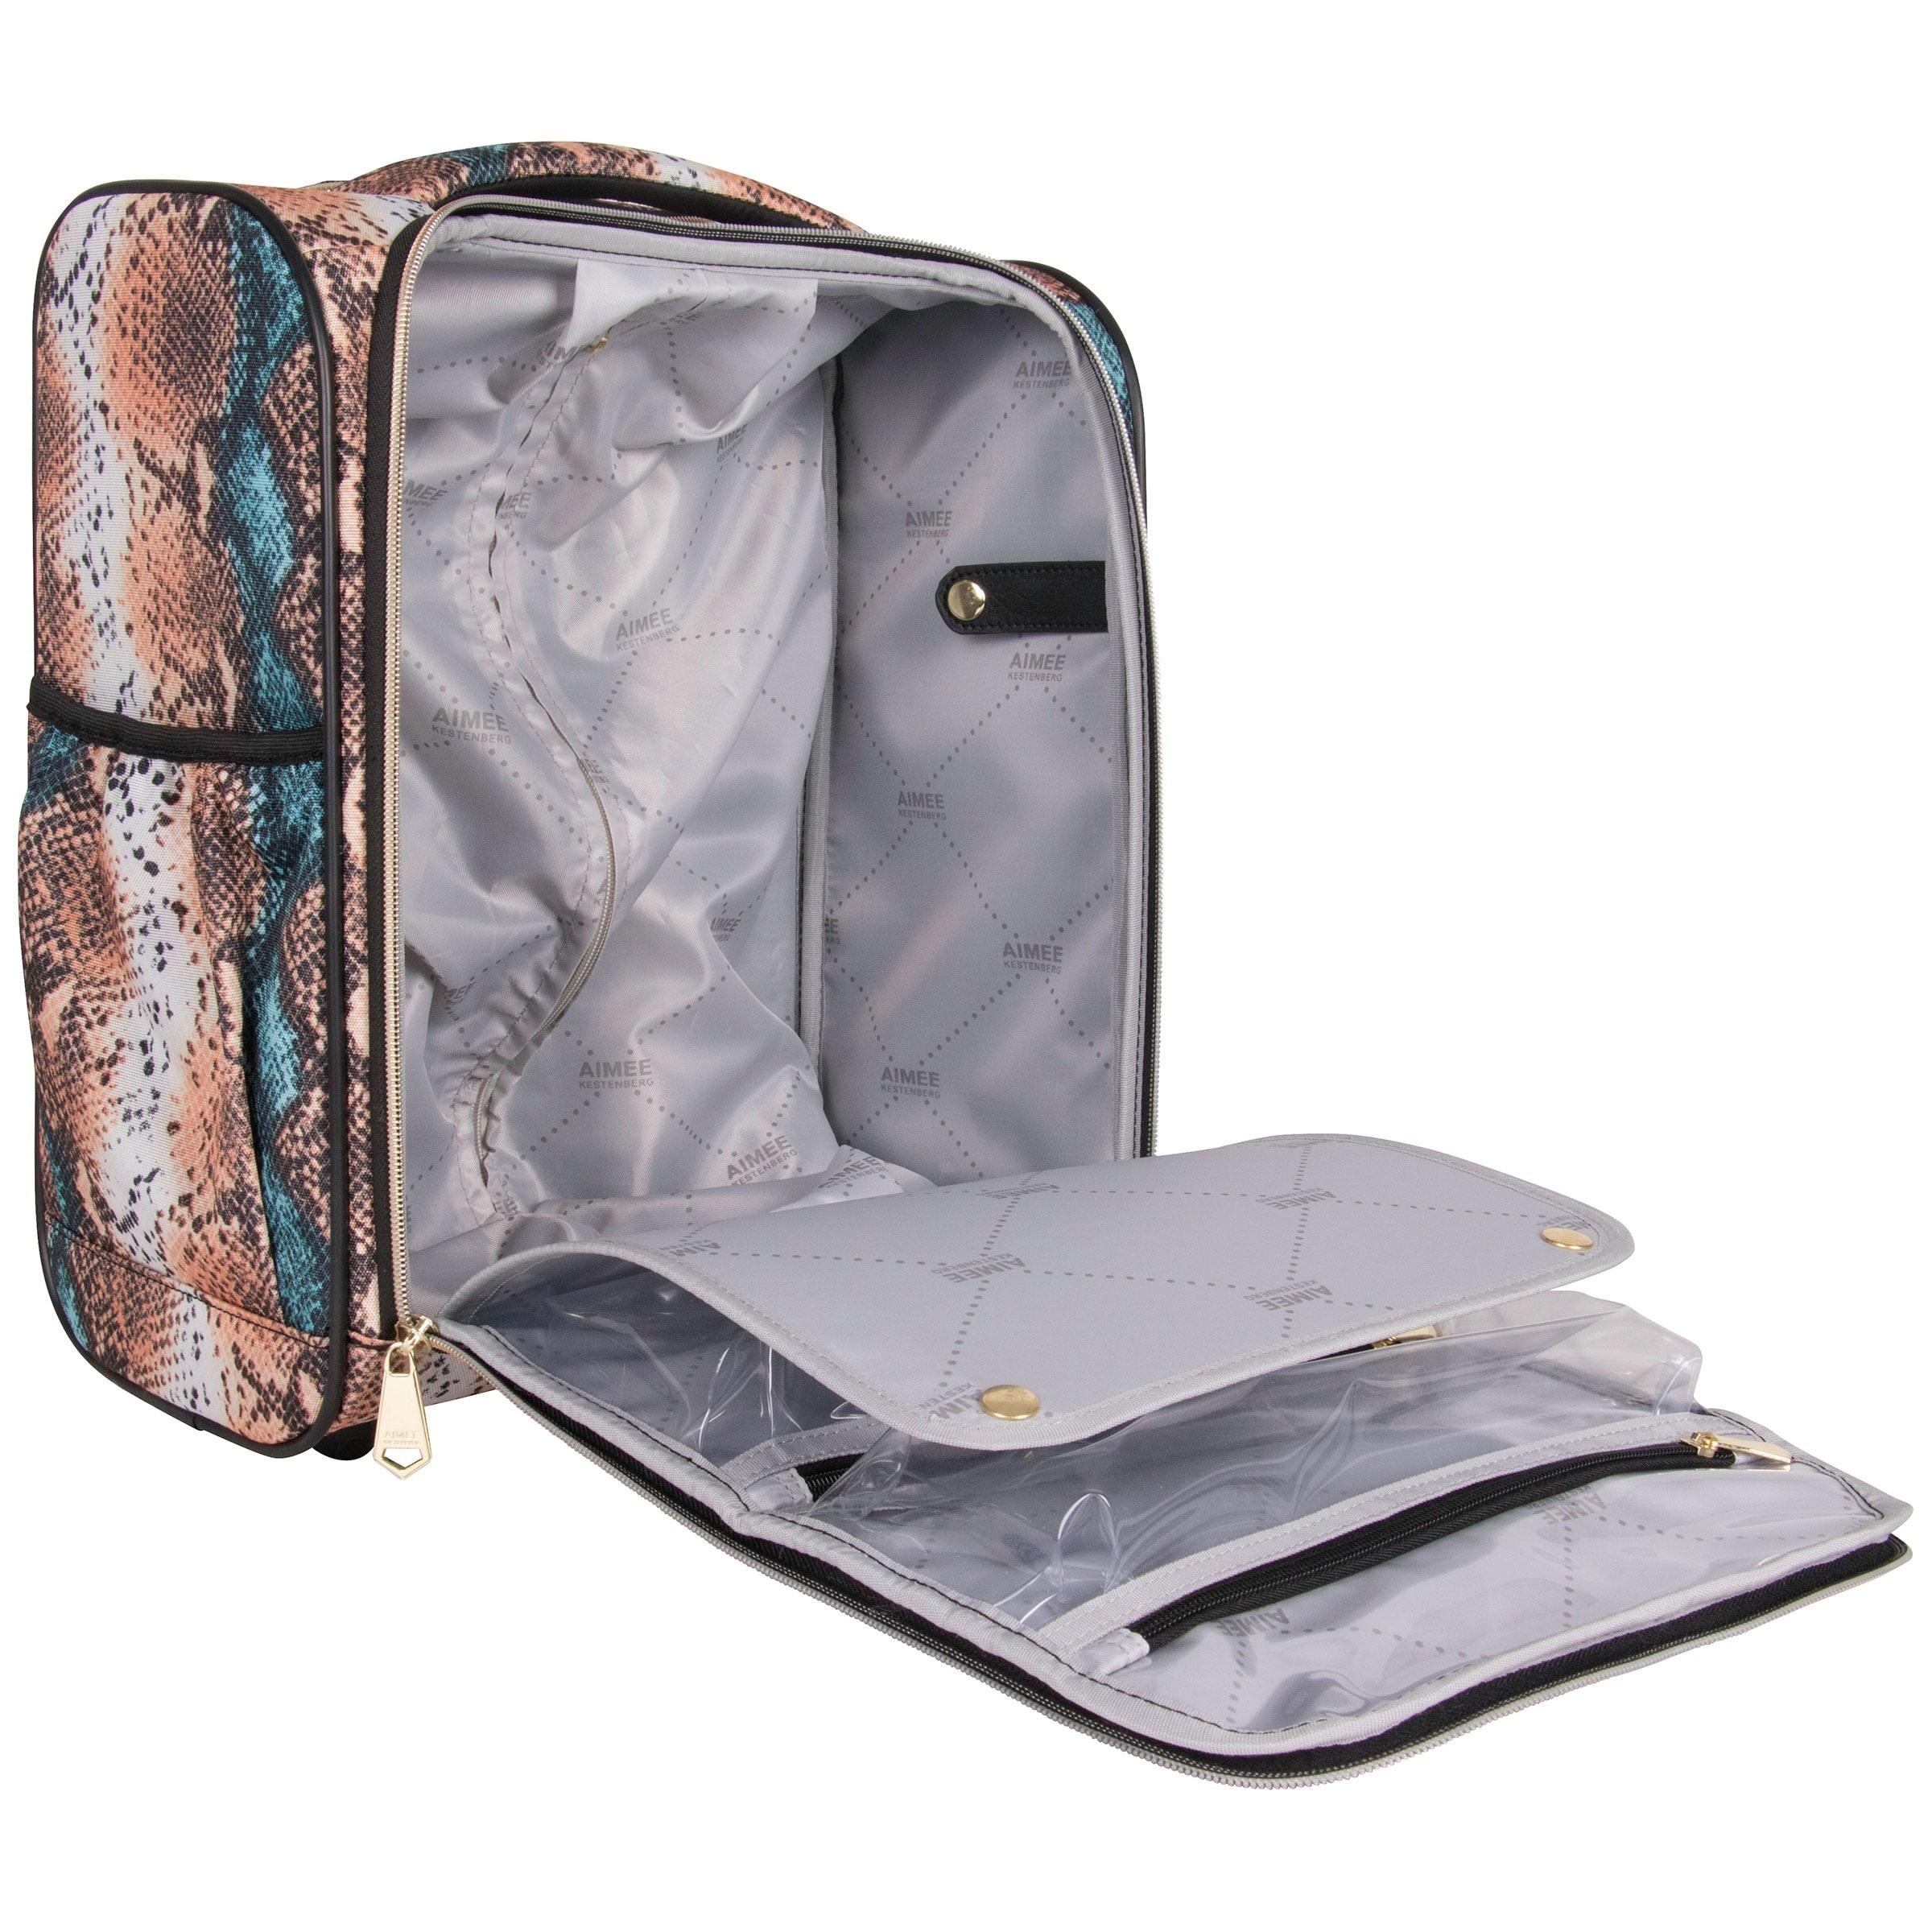 Aimee Kestenberg Sydney 15-inch Marine Python Printed Underseat Rolling  Carry On Tote Bag